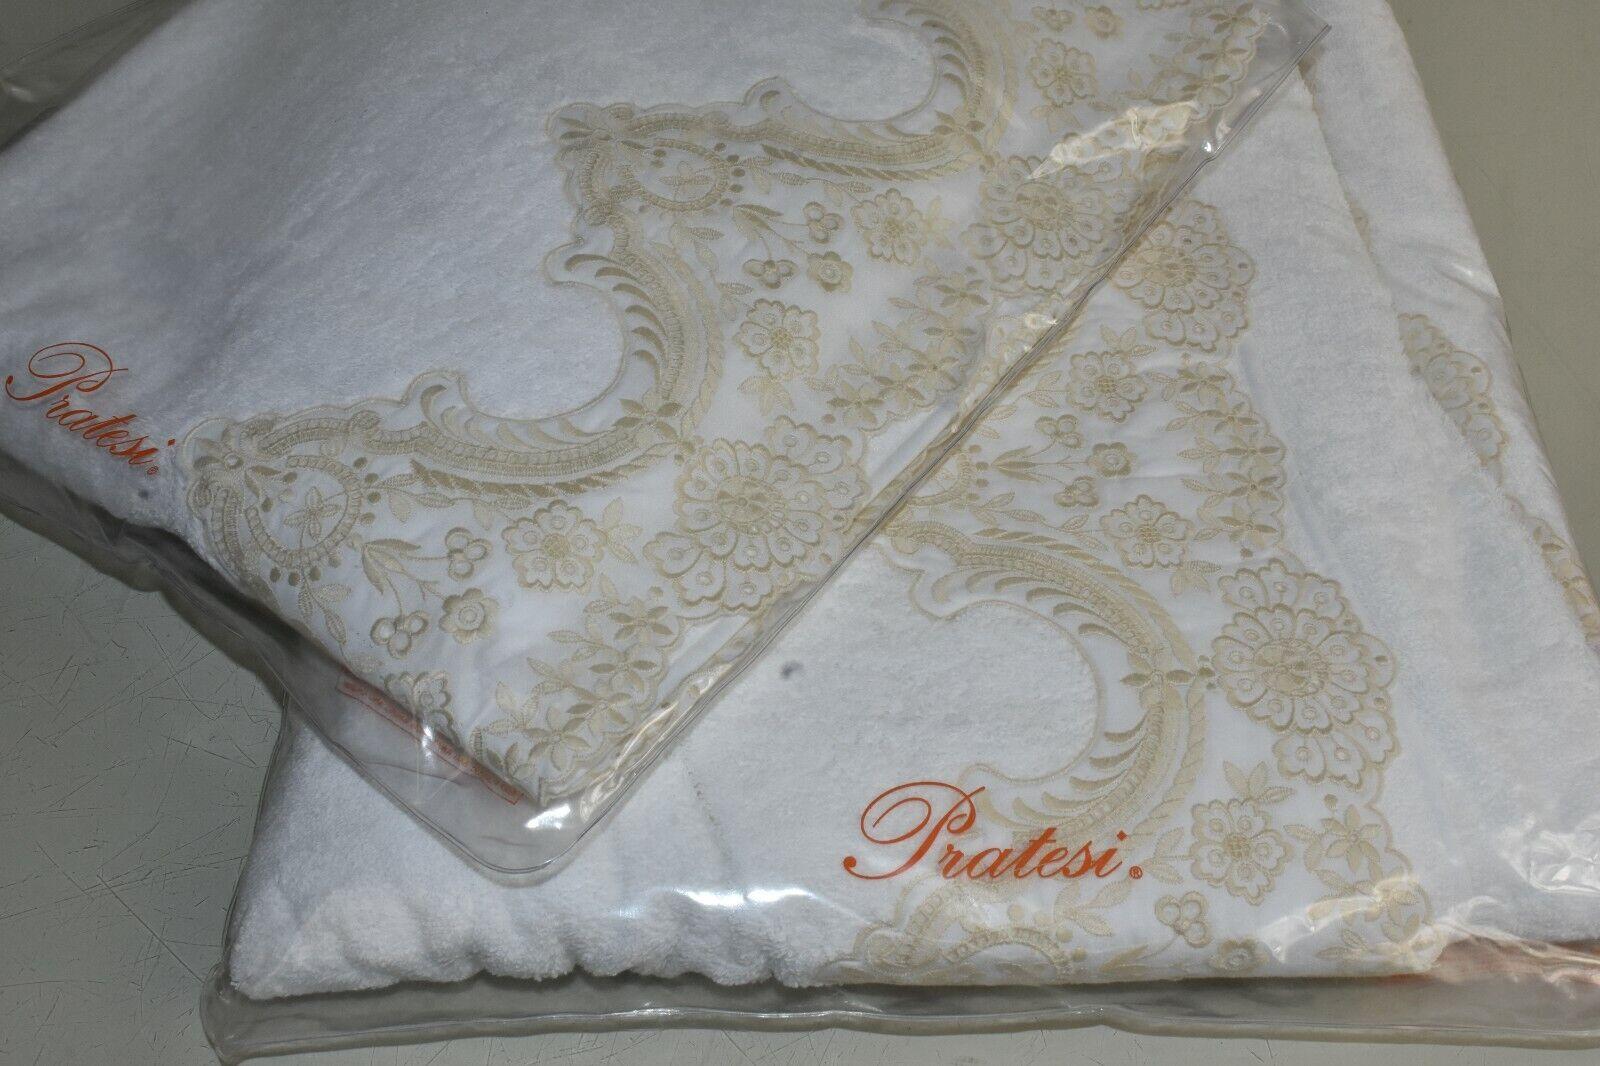 NEW Pratesi 2 PC SET Louvre Lace Embroidered Bath Towel Sheet White Beige